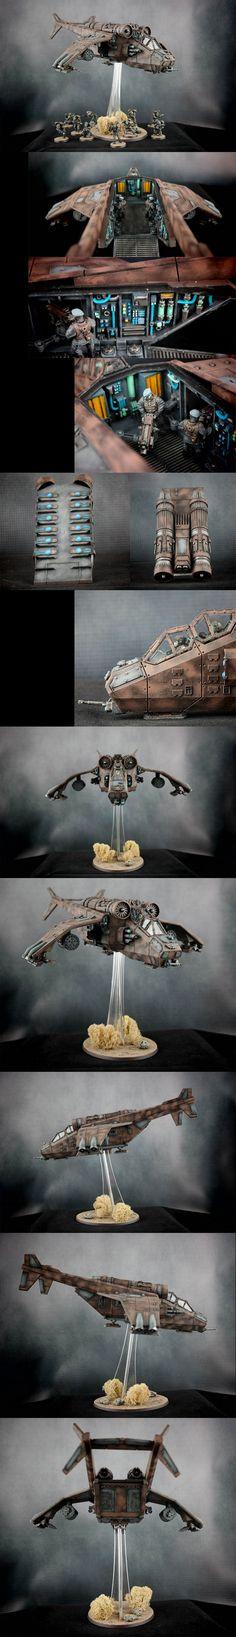 Astra Militarum, Militarum Tempestus, Imperial Navy - Valkyrie || Regiment: Lions of Leander VI || Warhammer 40k